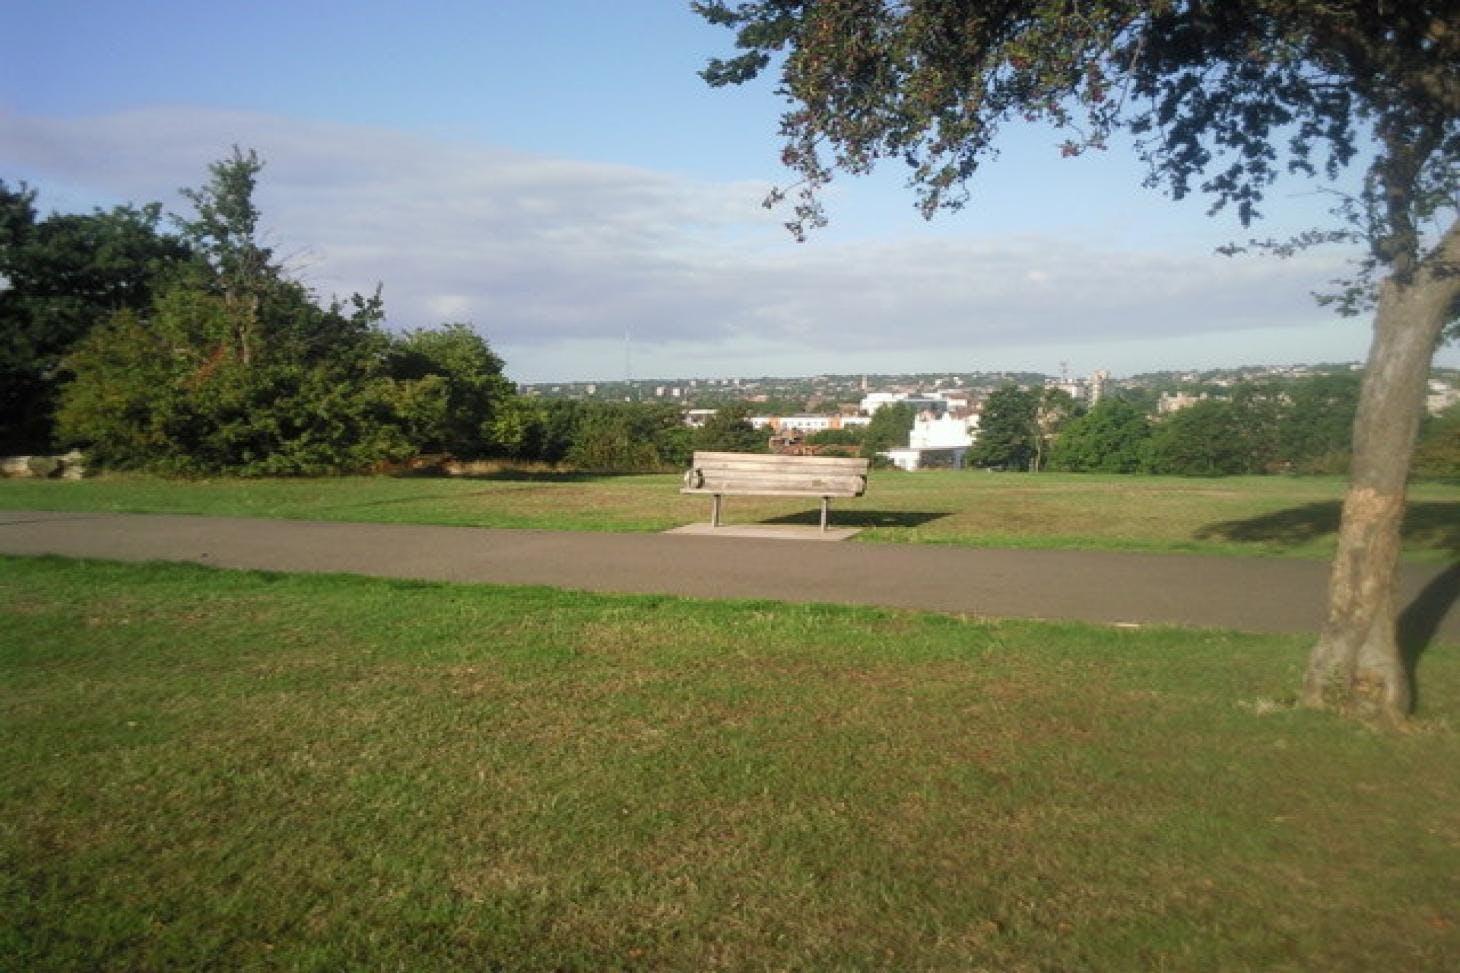 Mountsfield Park Outdoor | Hard (macadam) tennis court